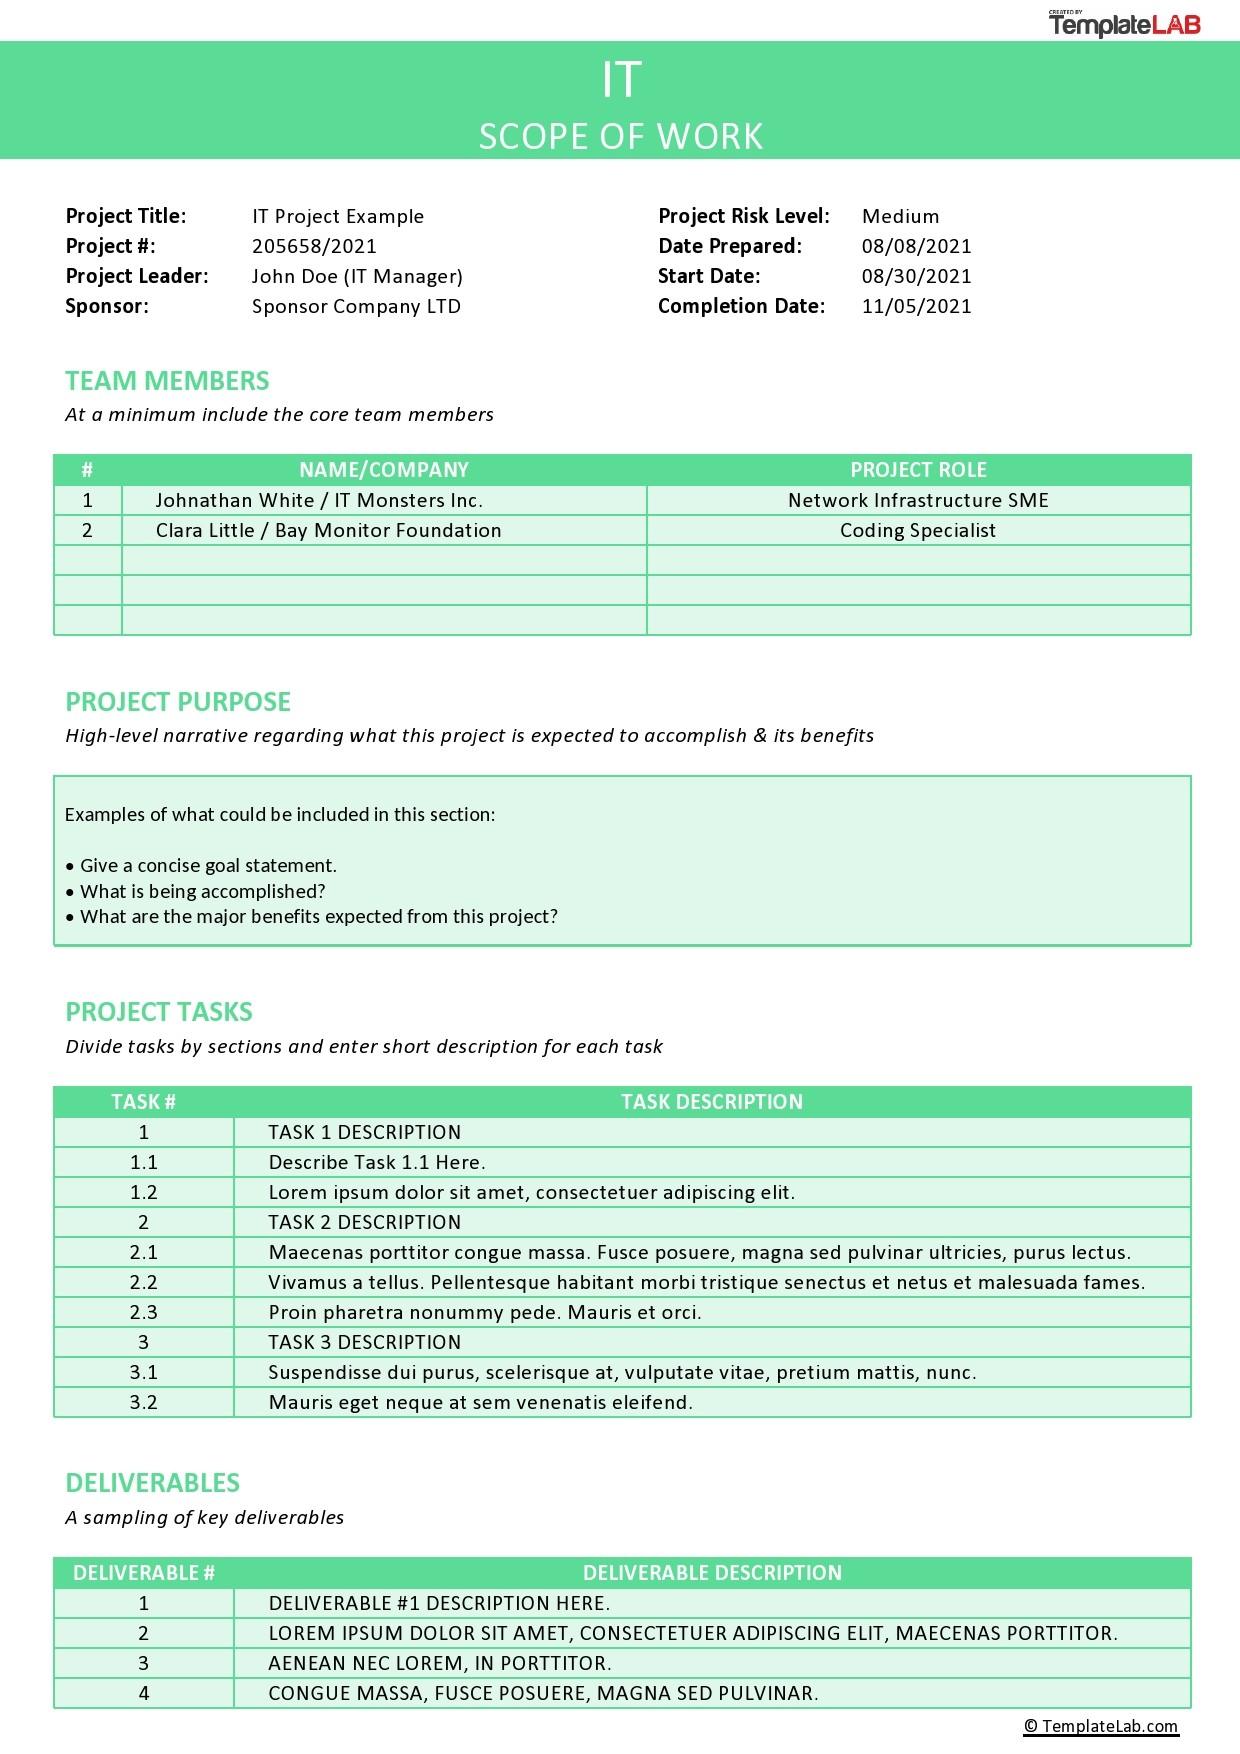 Free IT Scope of Work Template - TemplateLab.com